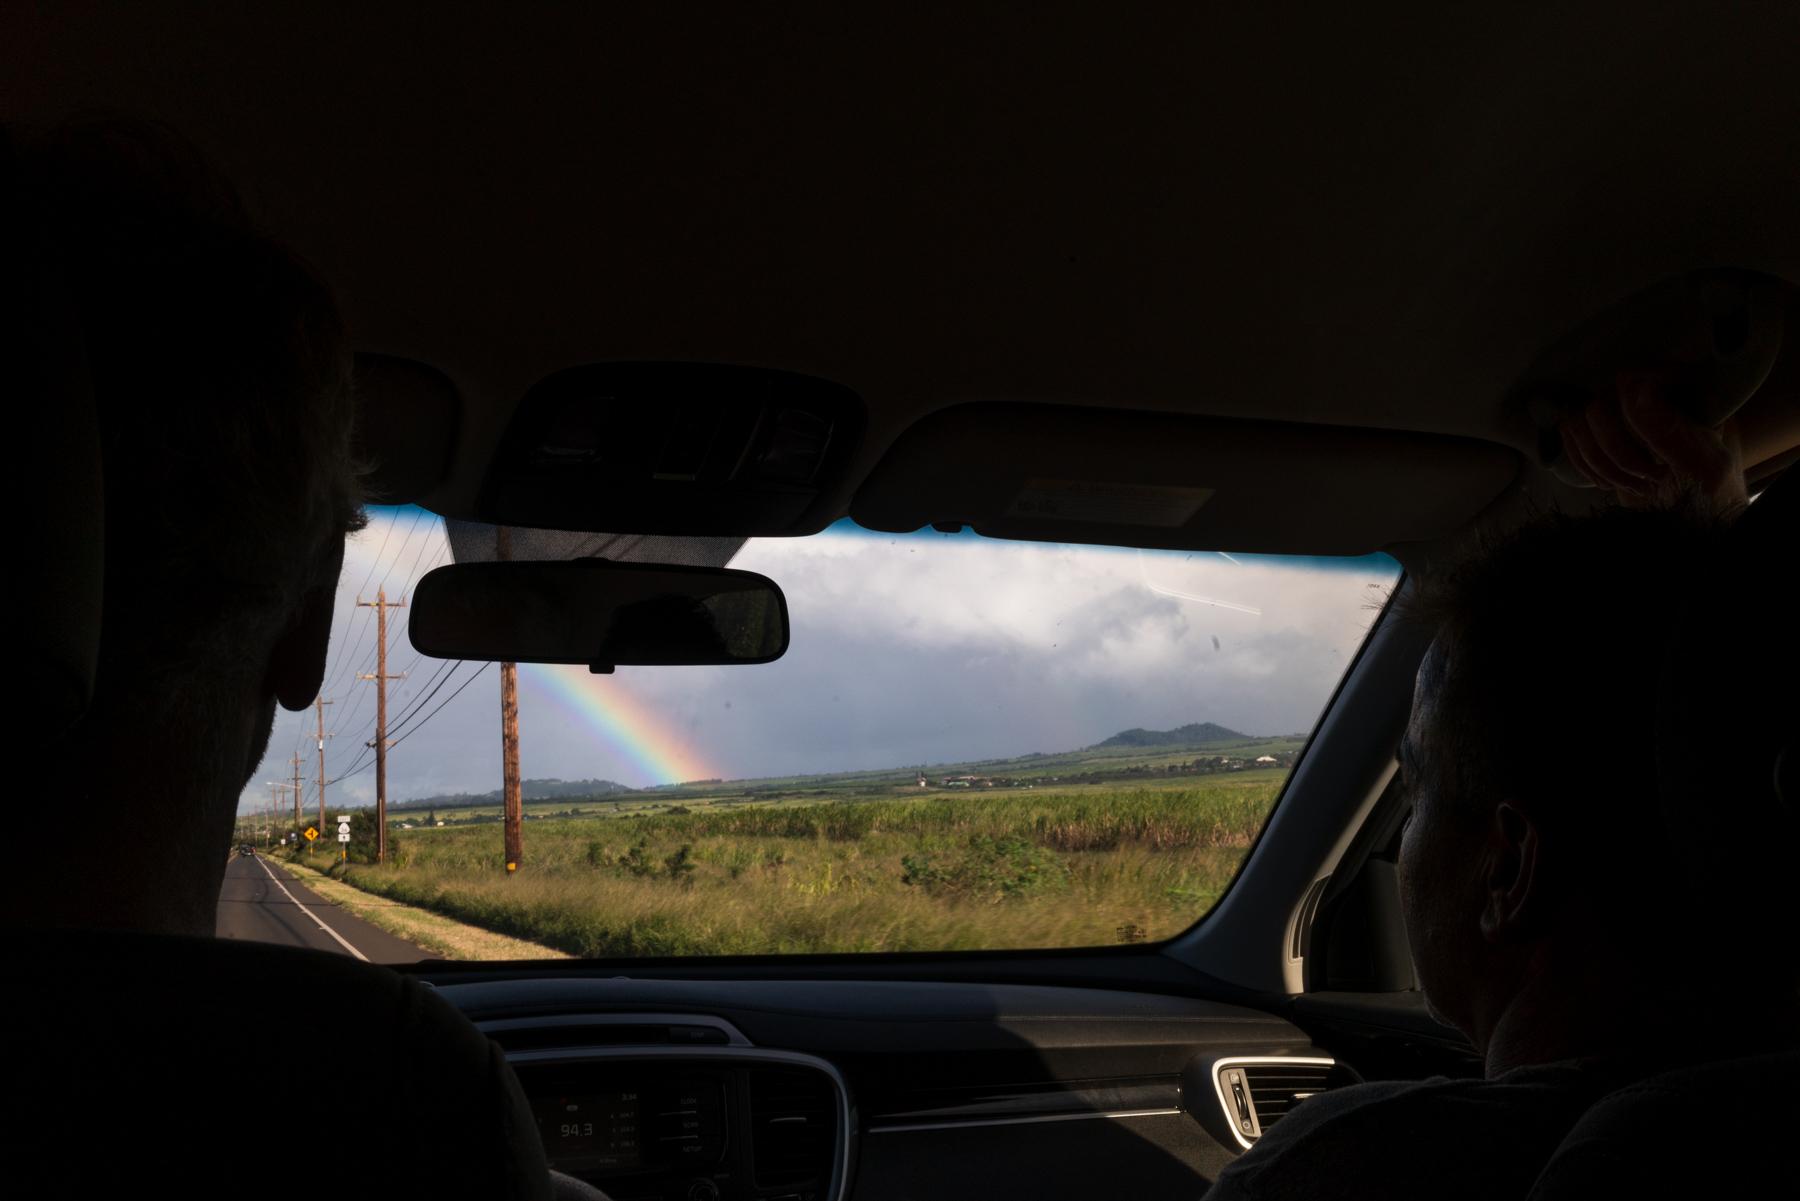 Maui-Trip-Kite-11.jpg